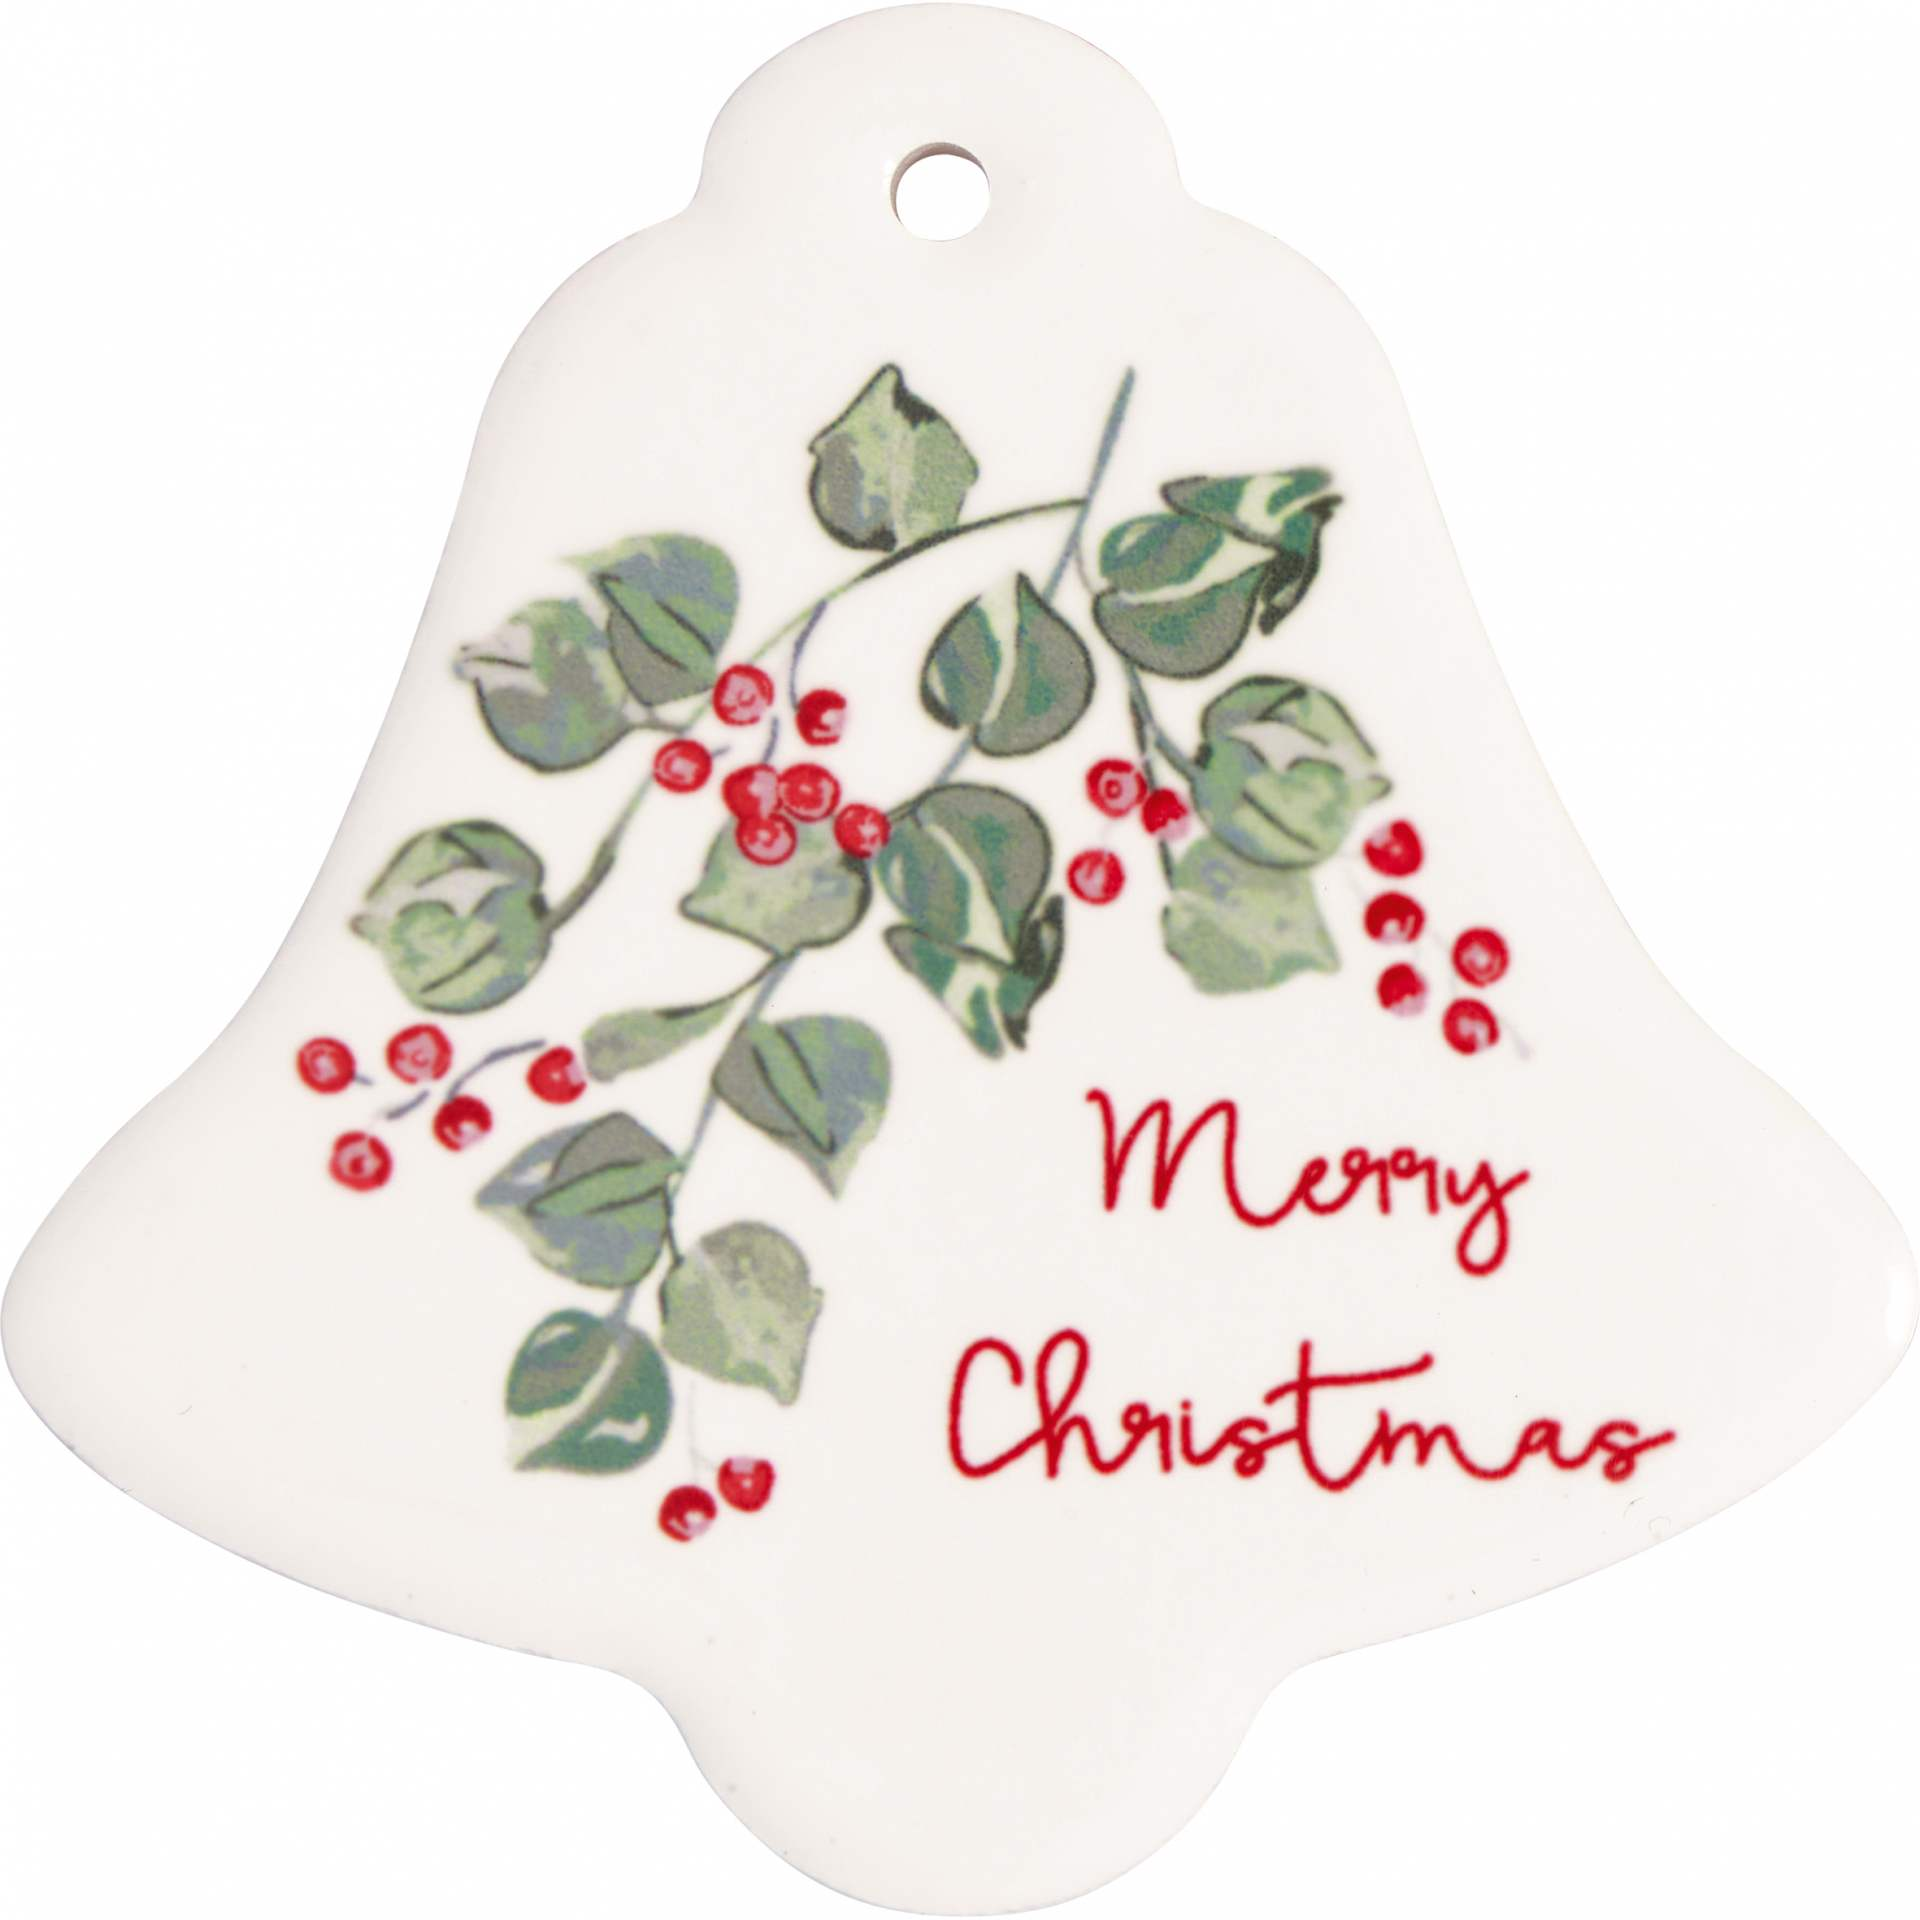 GREEN GATE Keramický magnet Merry Christmas White - Set 4 ks, bílá barva, keramika